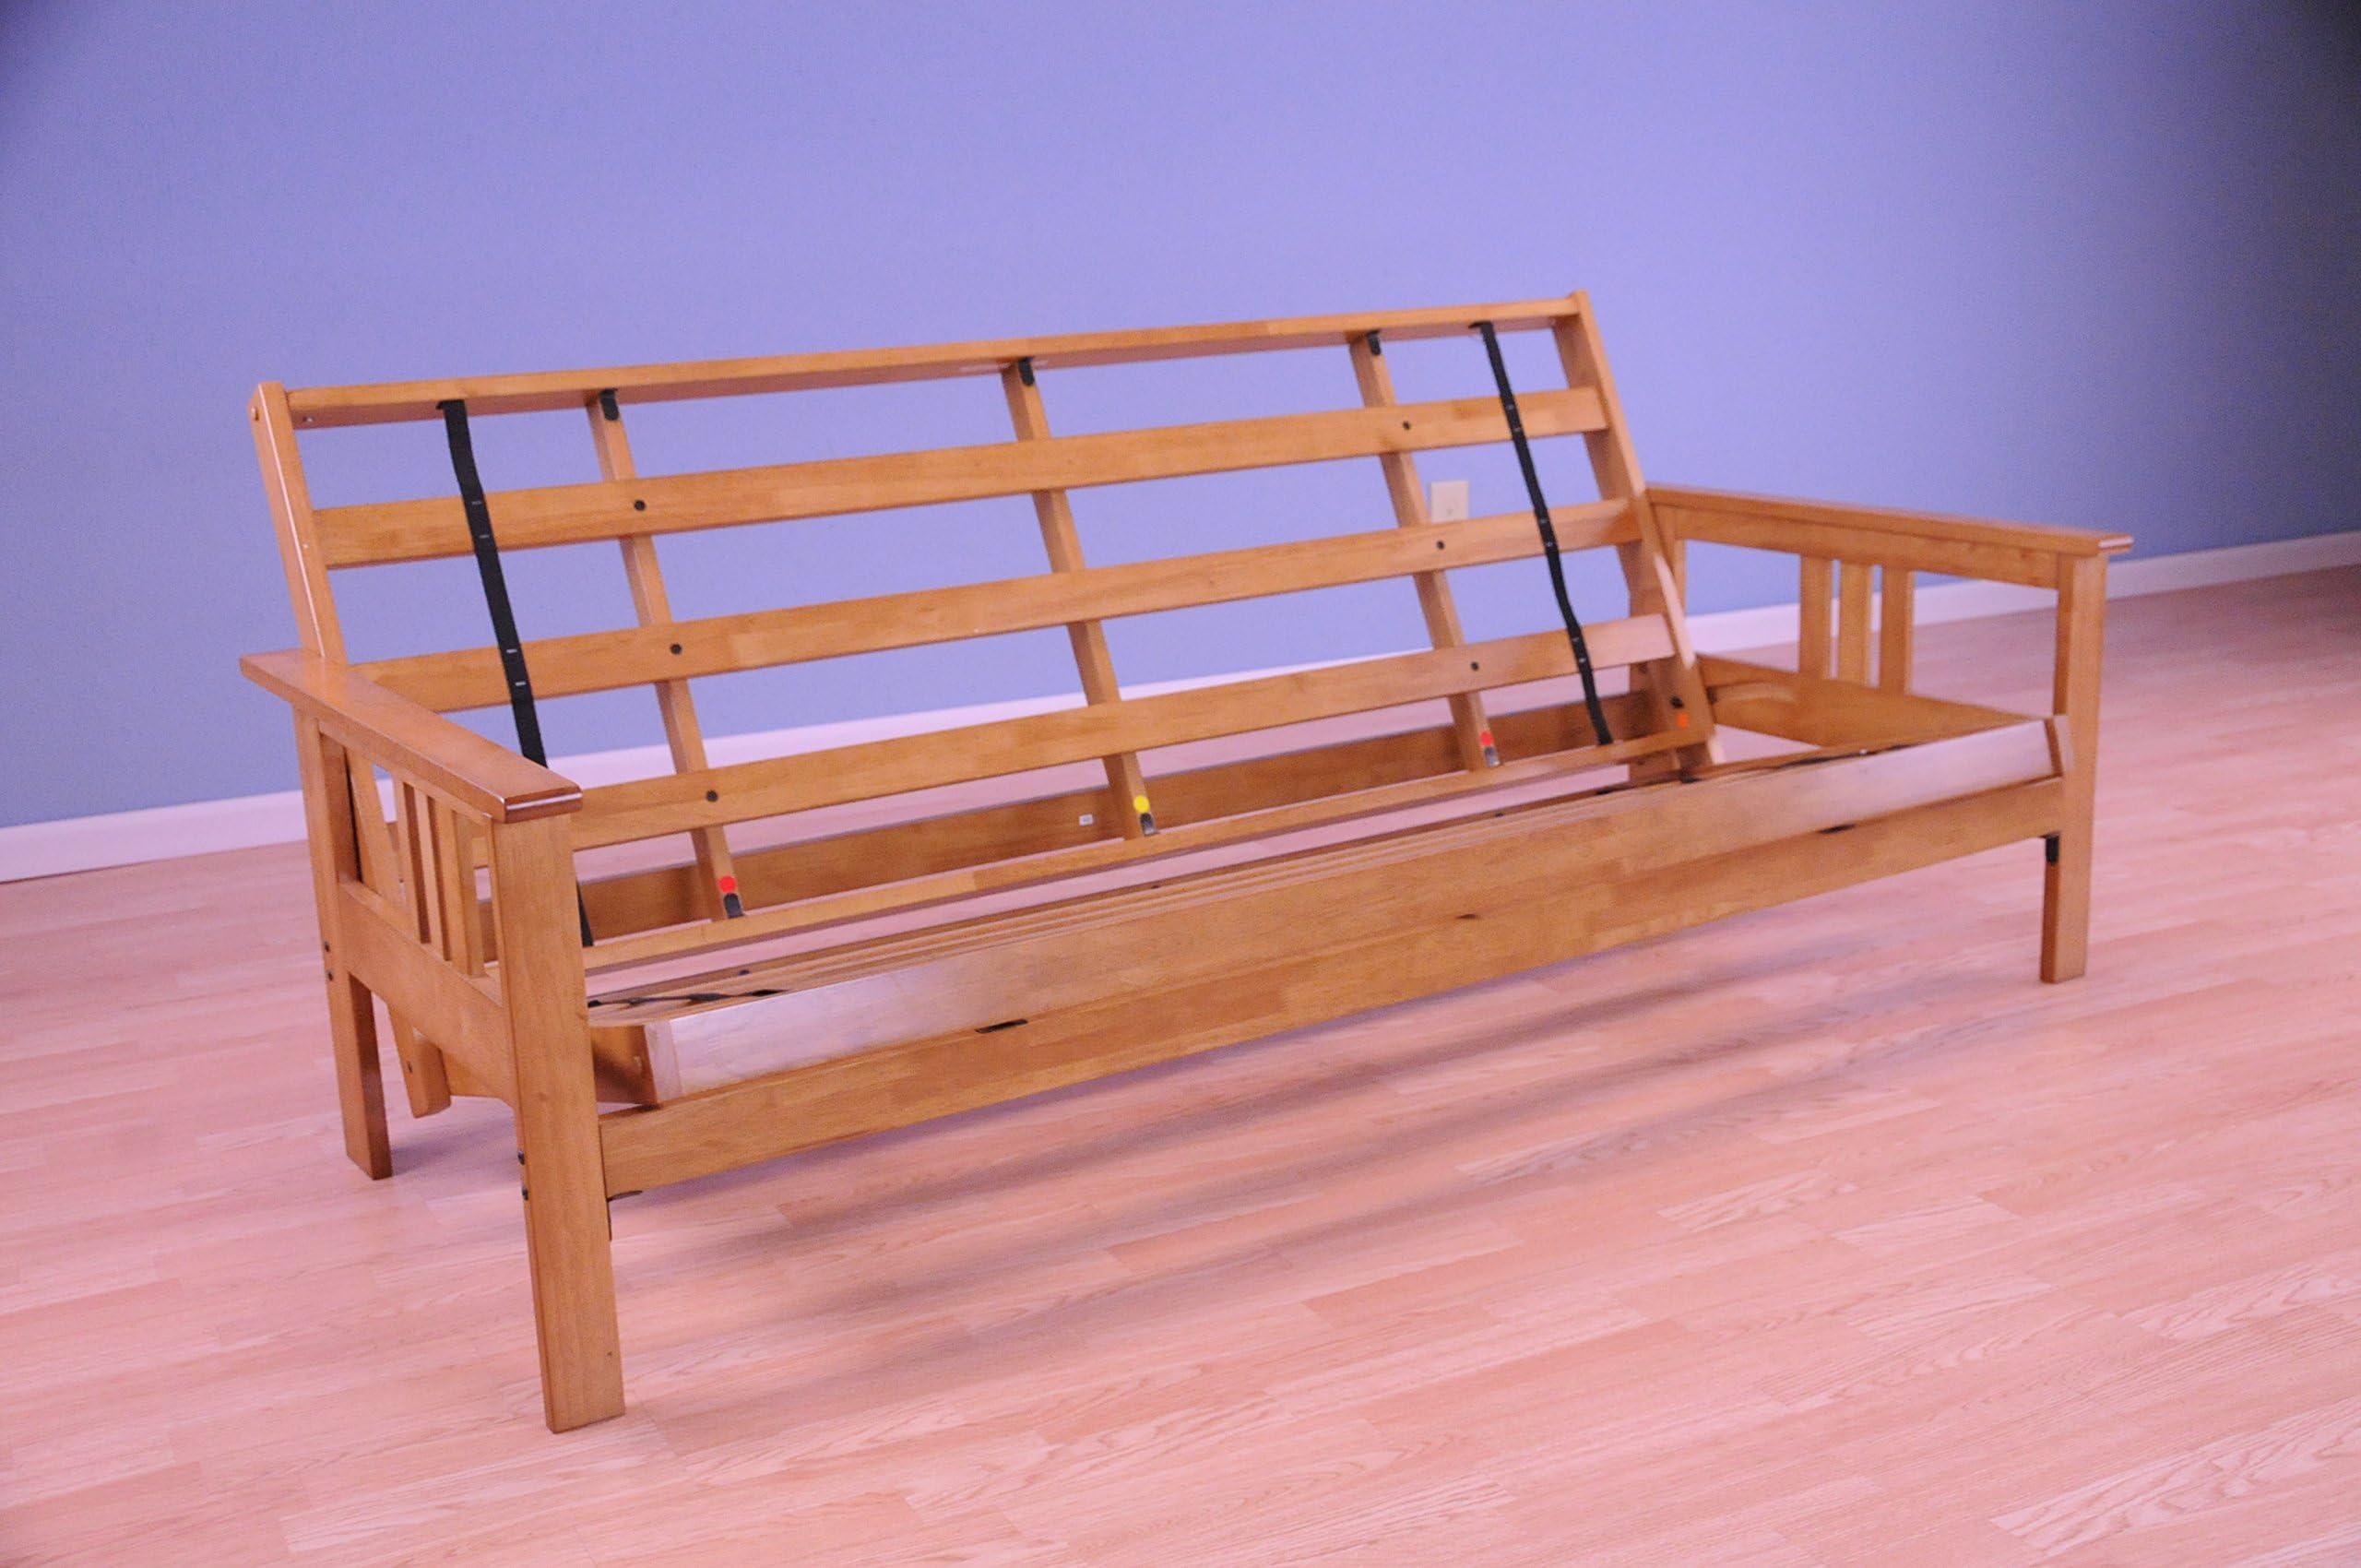 kodiak furniture kfmobtframeset2     futon frames   amazon    rh   amazon